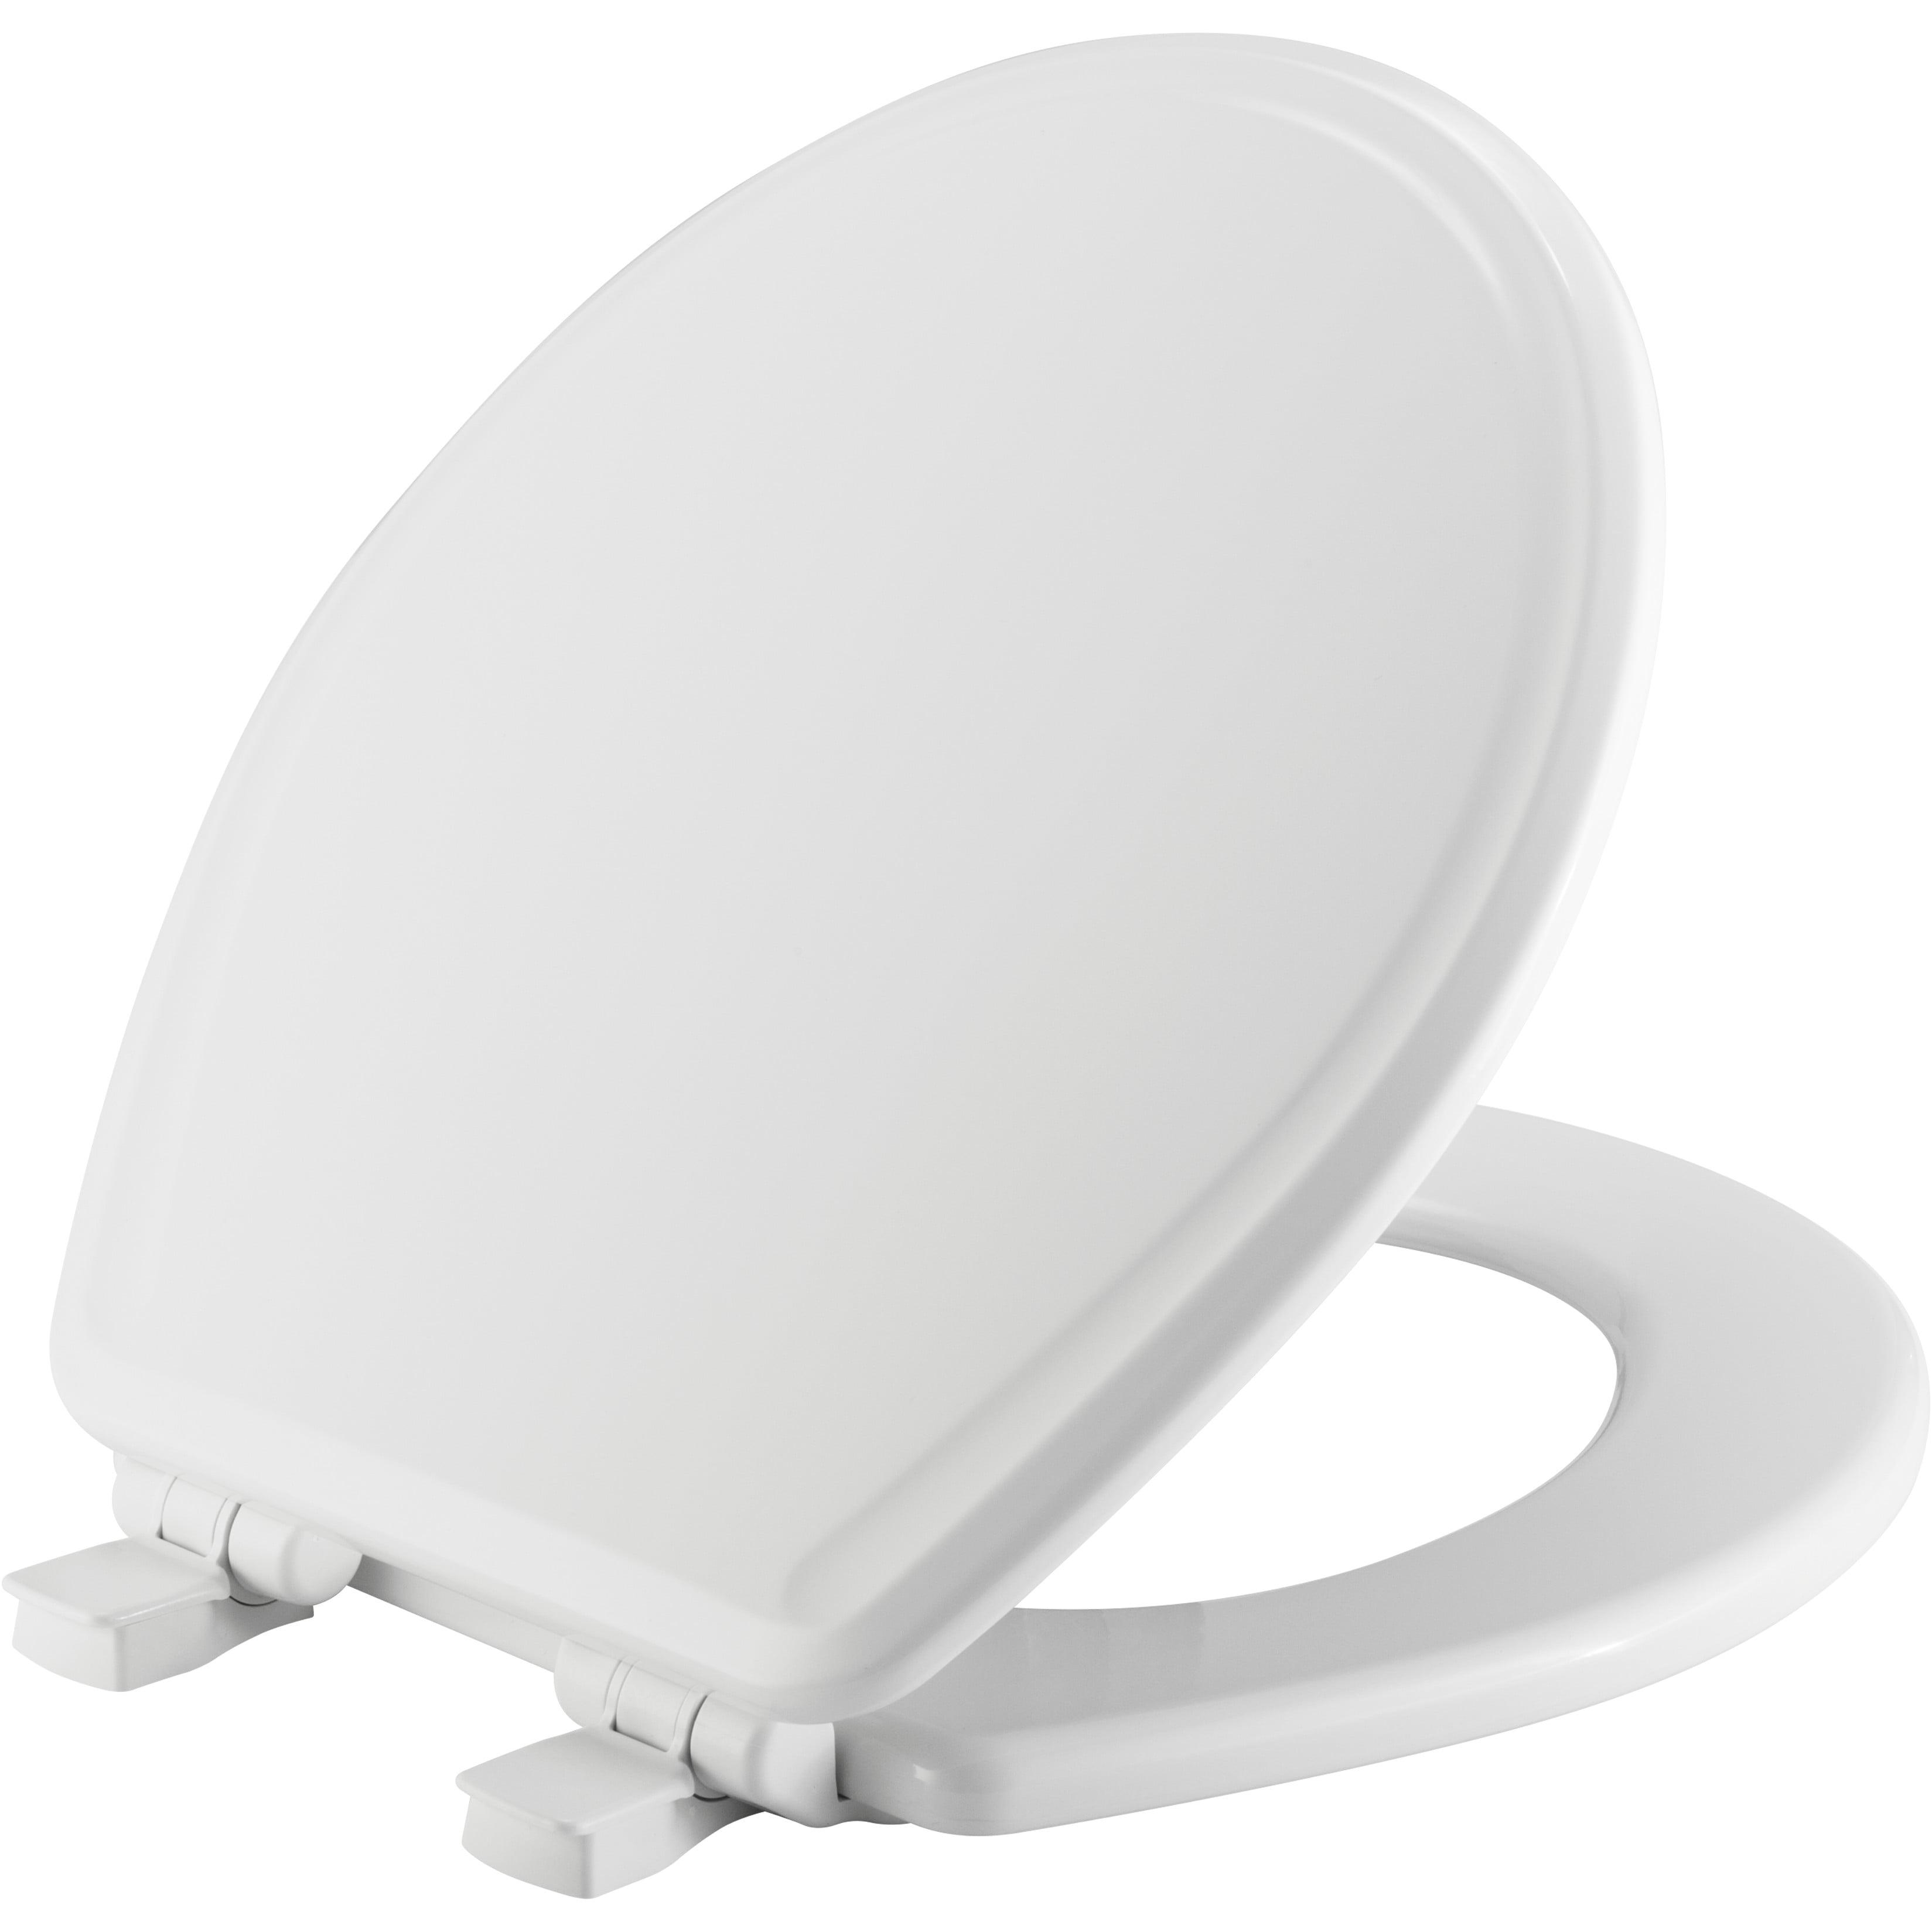 Fabulous Mayfair Easyclean Round Enameled Wood Toilet Seat In White With Sta Tite Walmart Com Evergreenethics Interior Chair Design Evergreenethicsorg